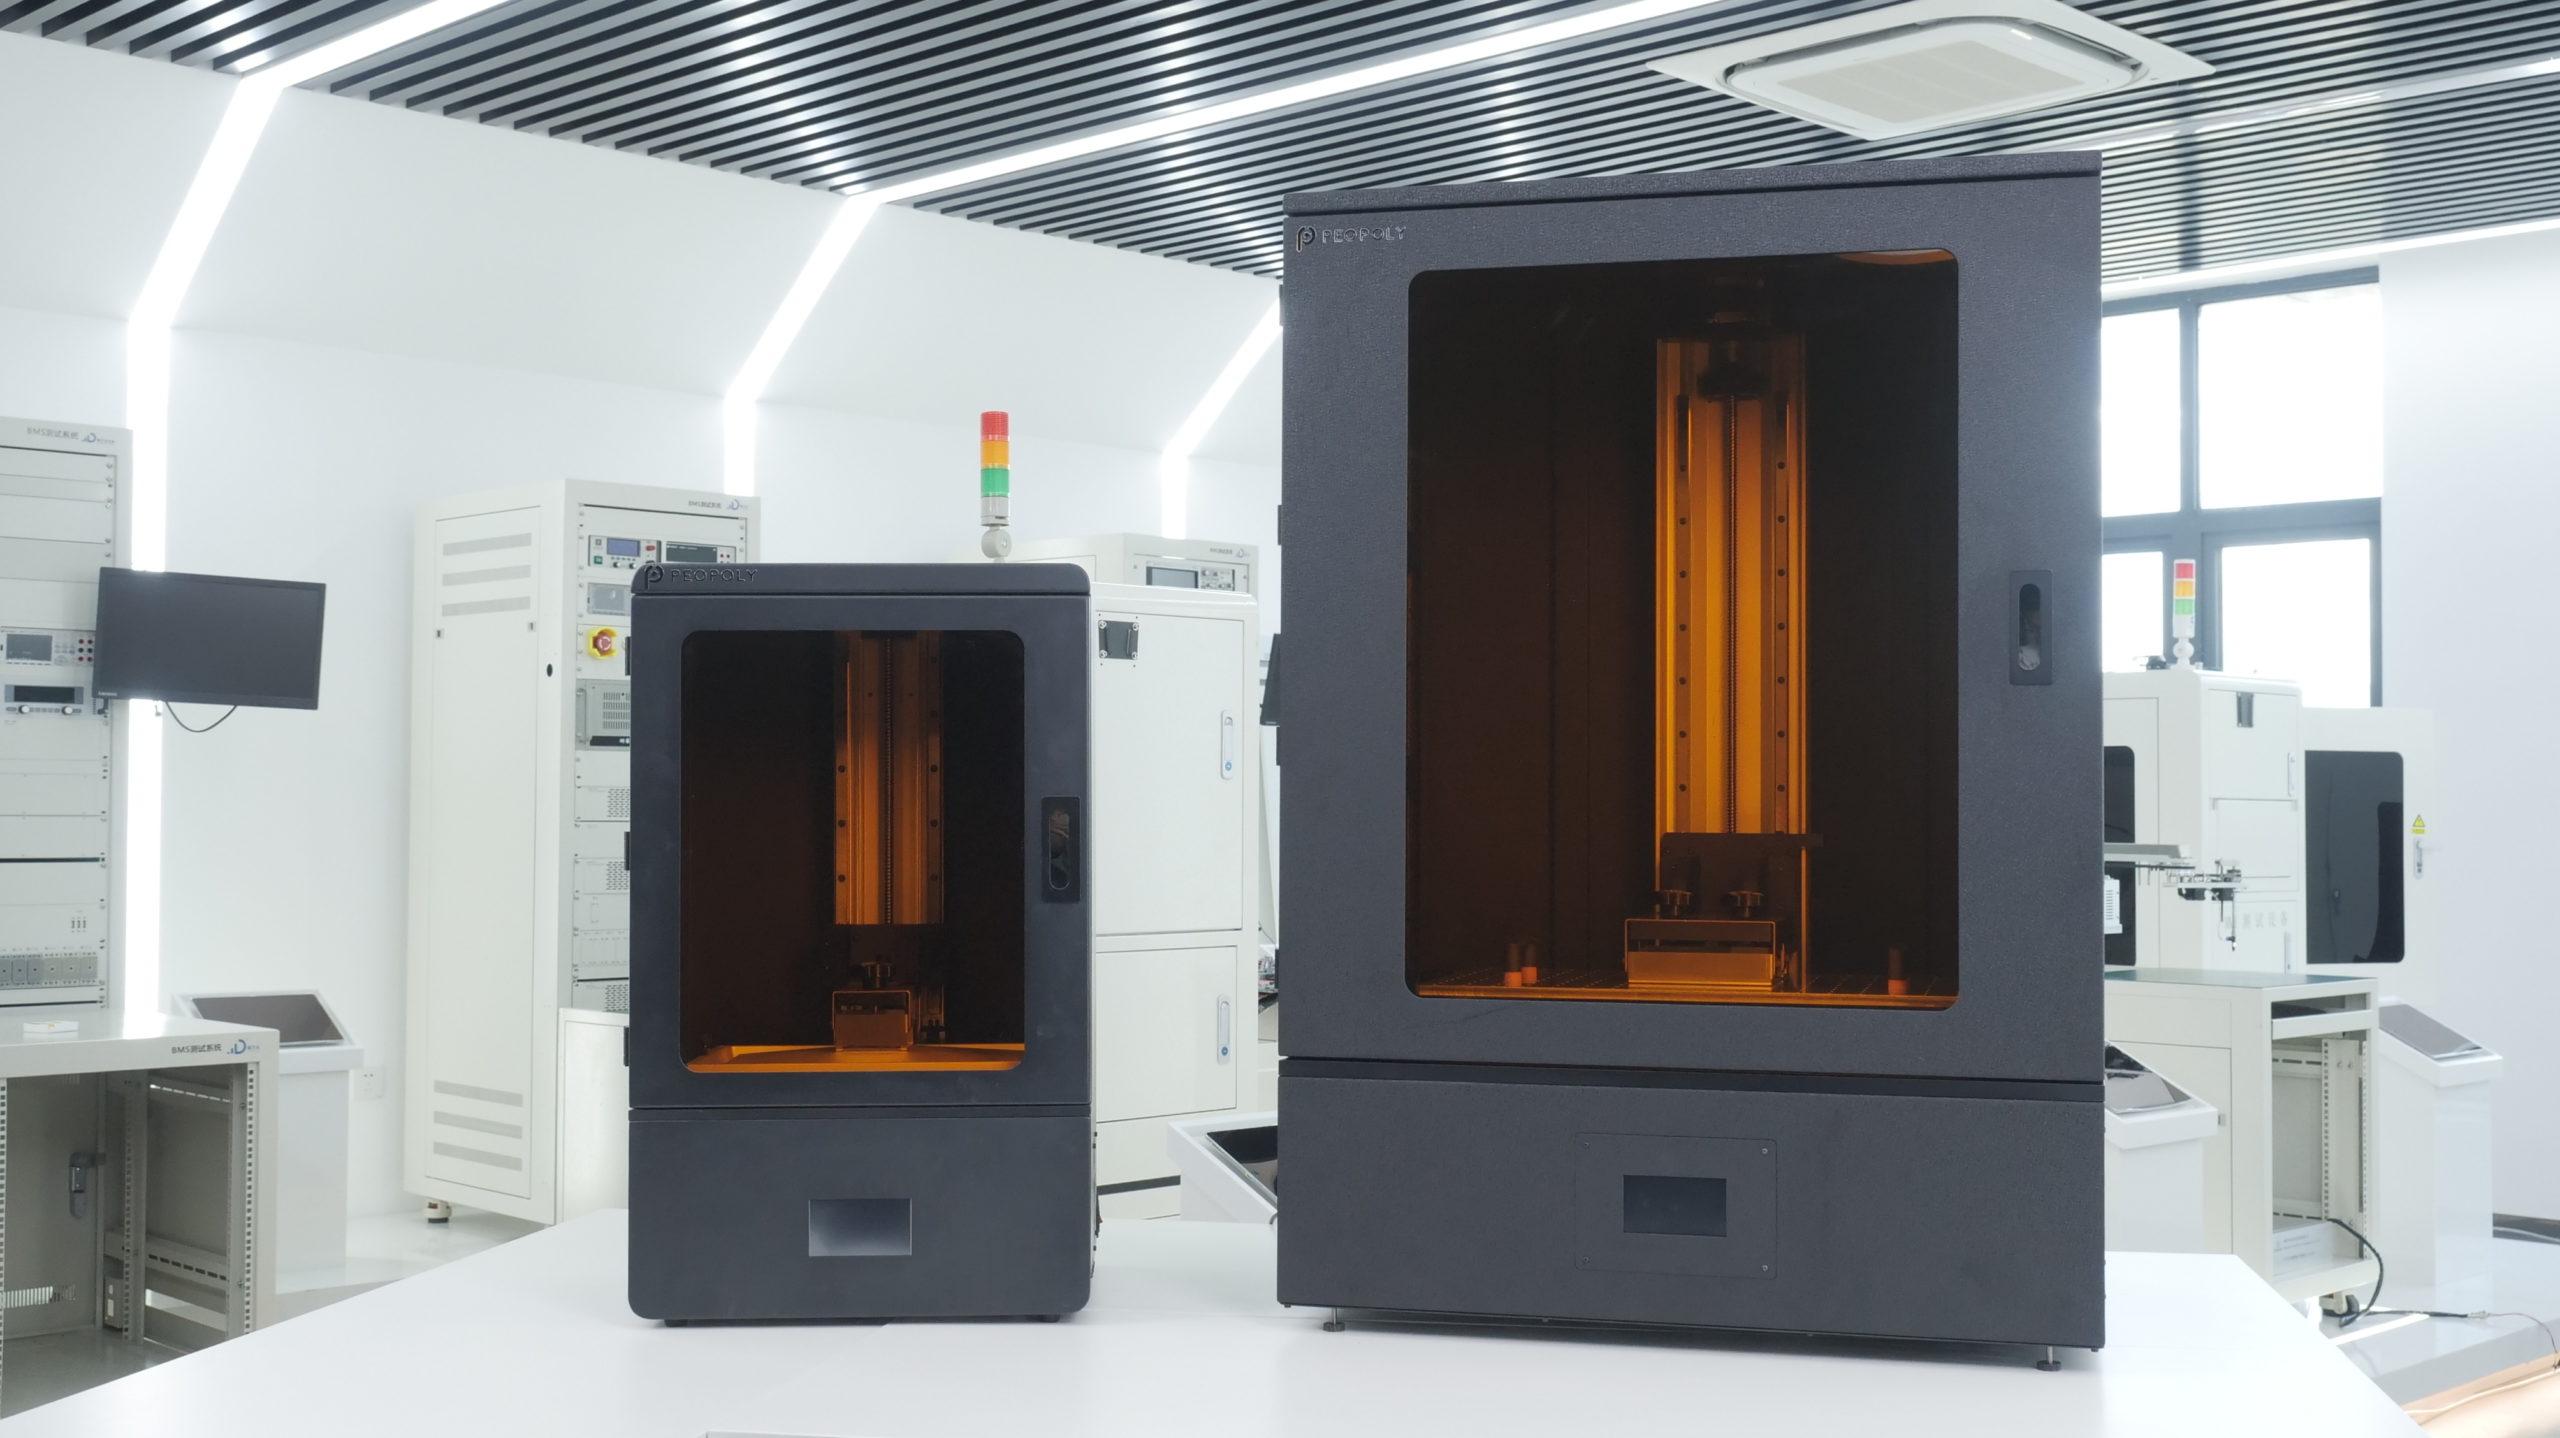 Peopoly Releases Bigger, Faster Phenom XXL DLP 3D Printer